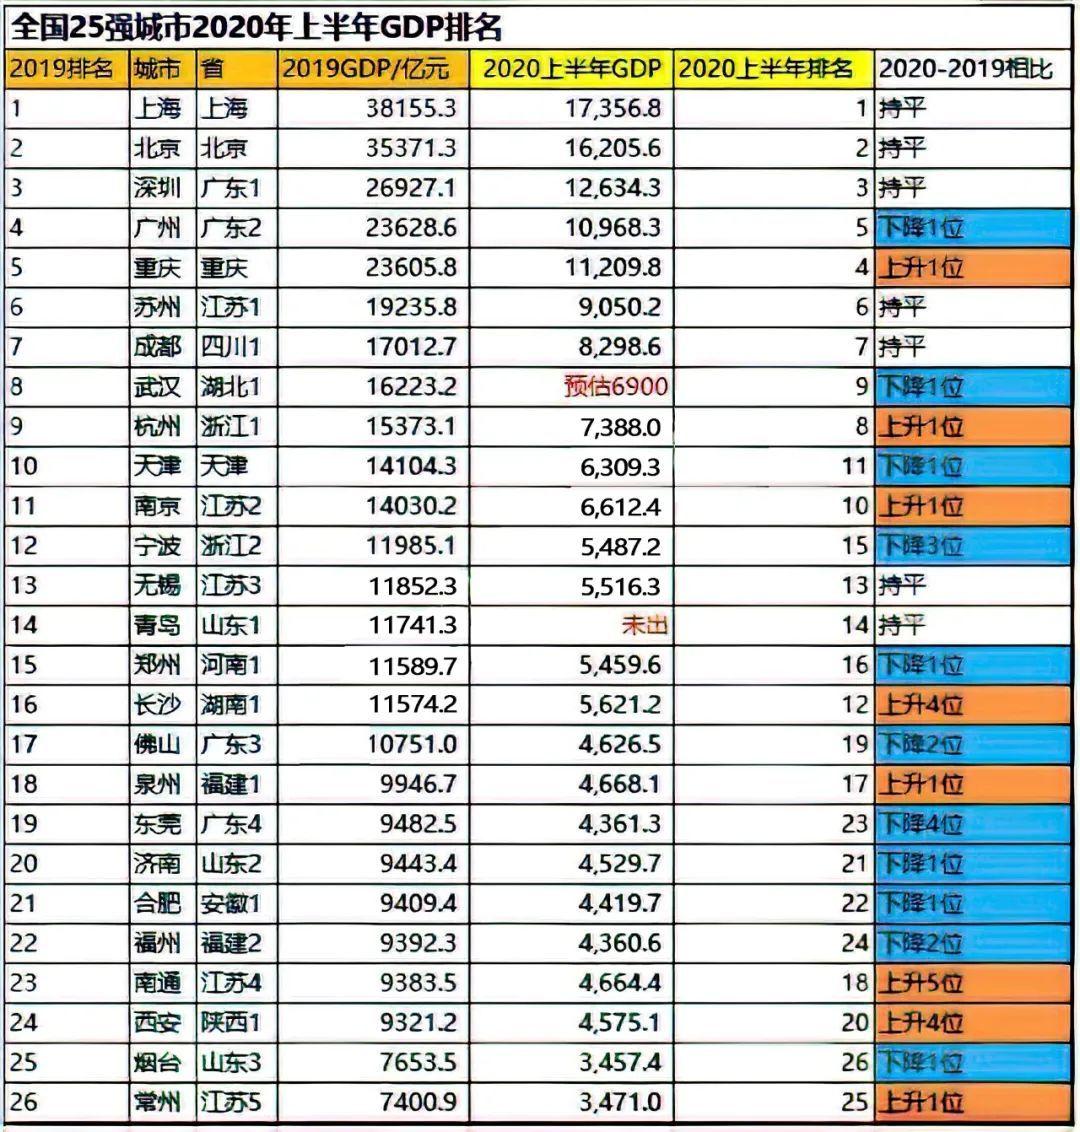 2019gdp城市排名_中国城市GDP排名2019年排行榜:2019年GDP副省级城市排名